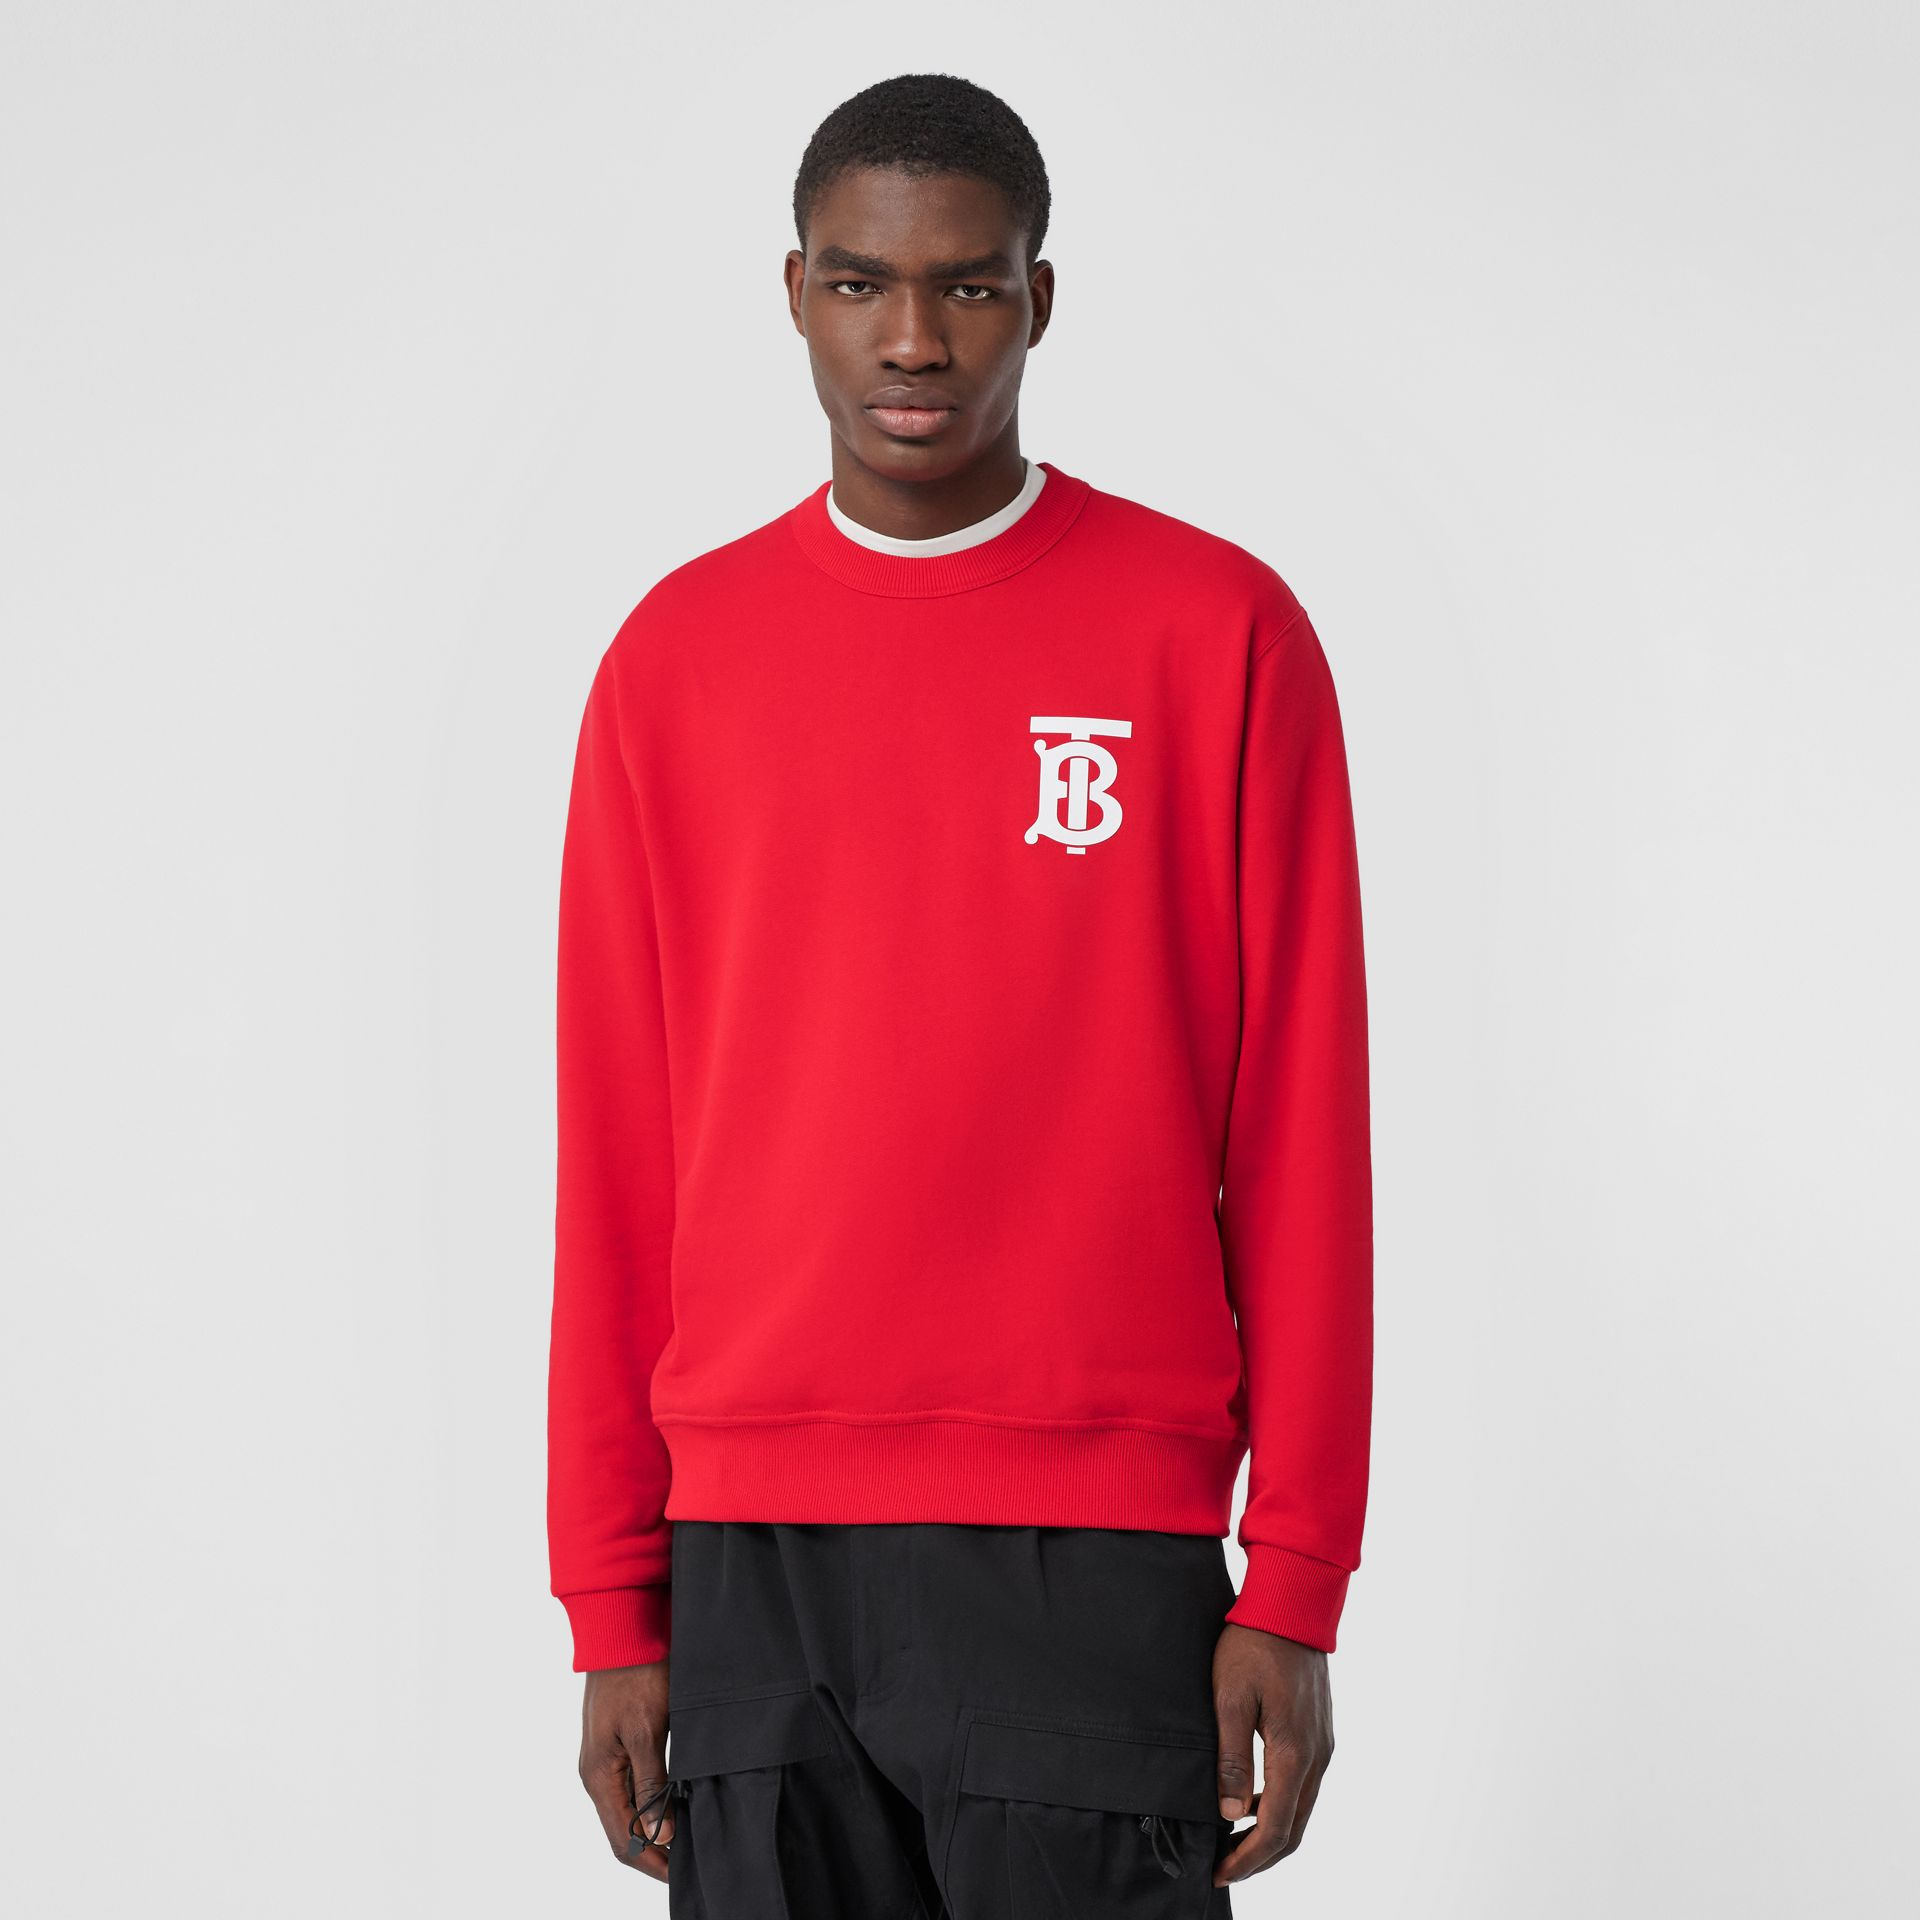 Monogram Motif Cotton Sweatshirt in Bright Red - Men | Burberry United Kingdom - gallery image 0